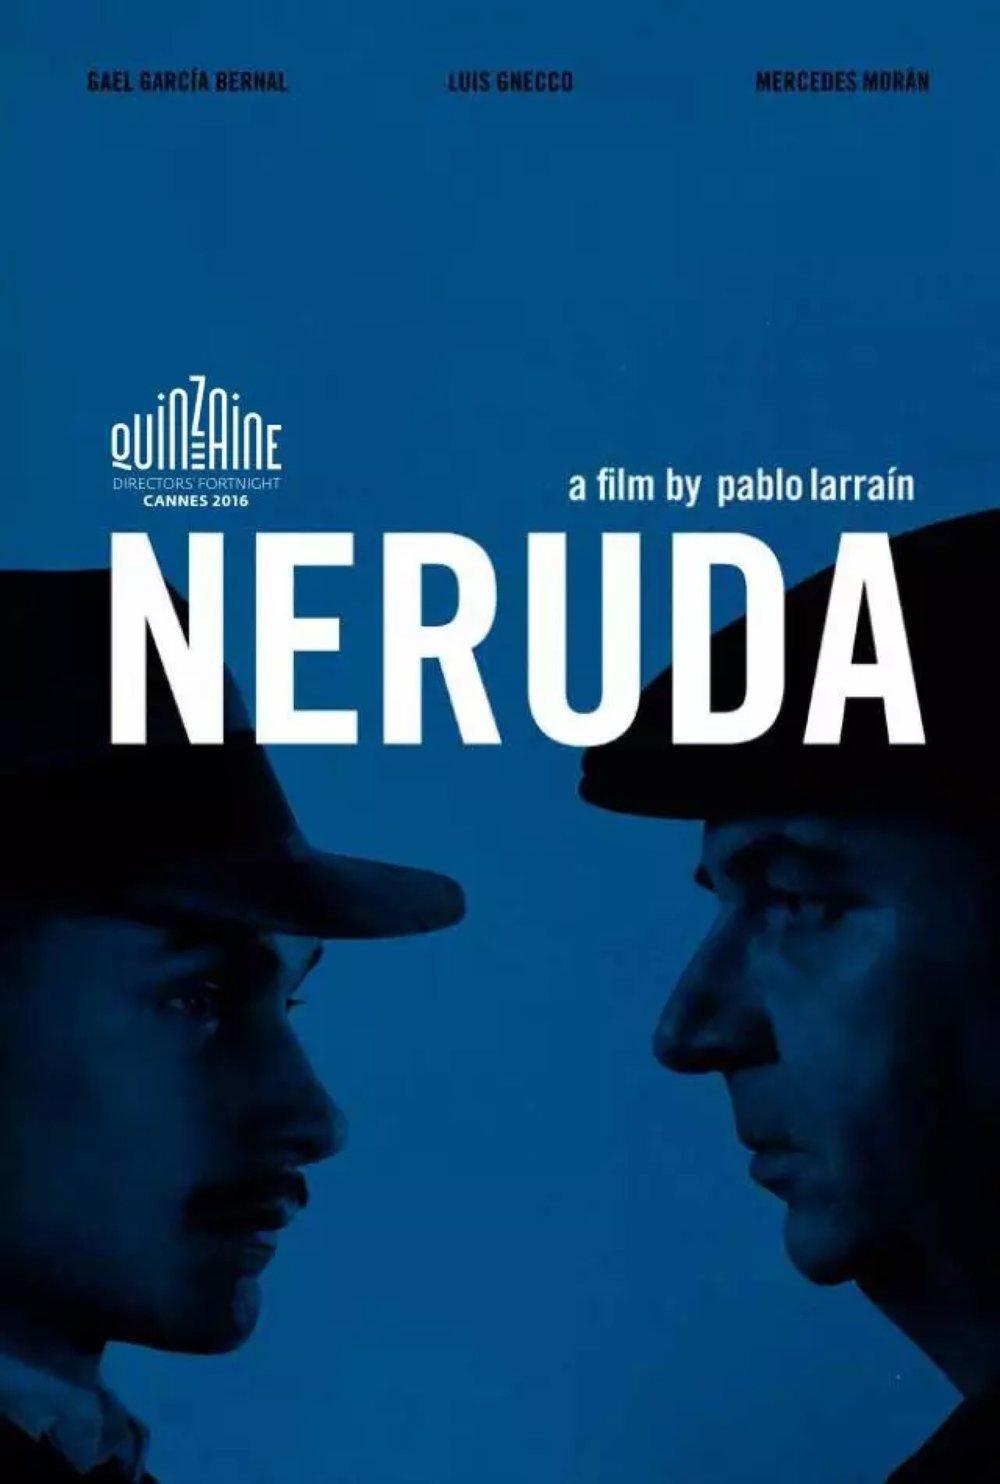 Neruda   导演:帕布罗·拉雷恩 语言:西班牙语 上映日期:2016-05-13(戛纳电影节) 片长:107分钟